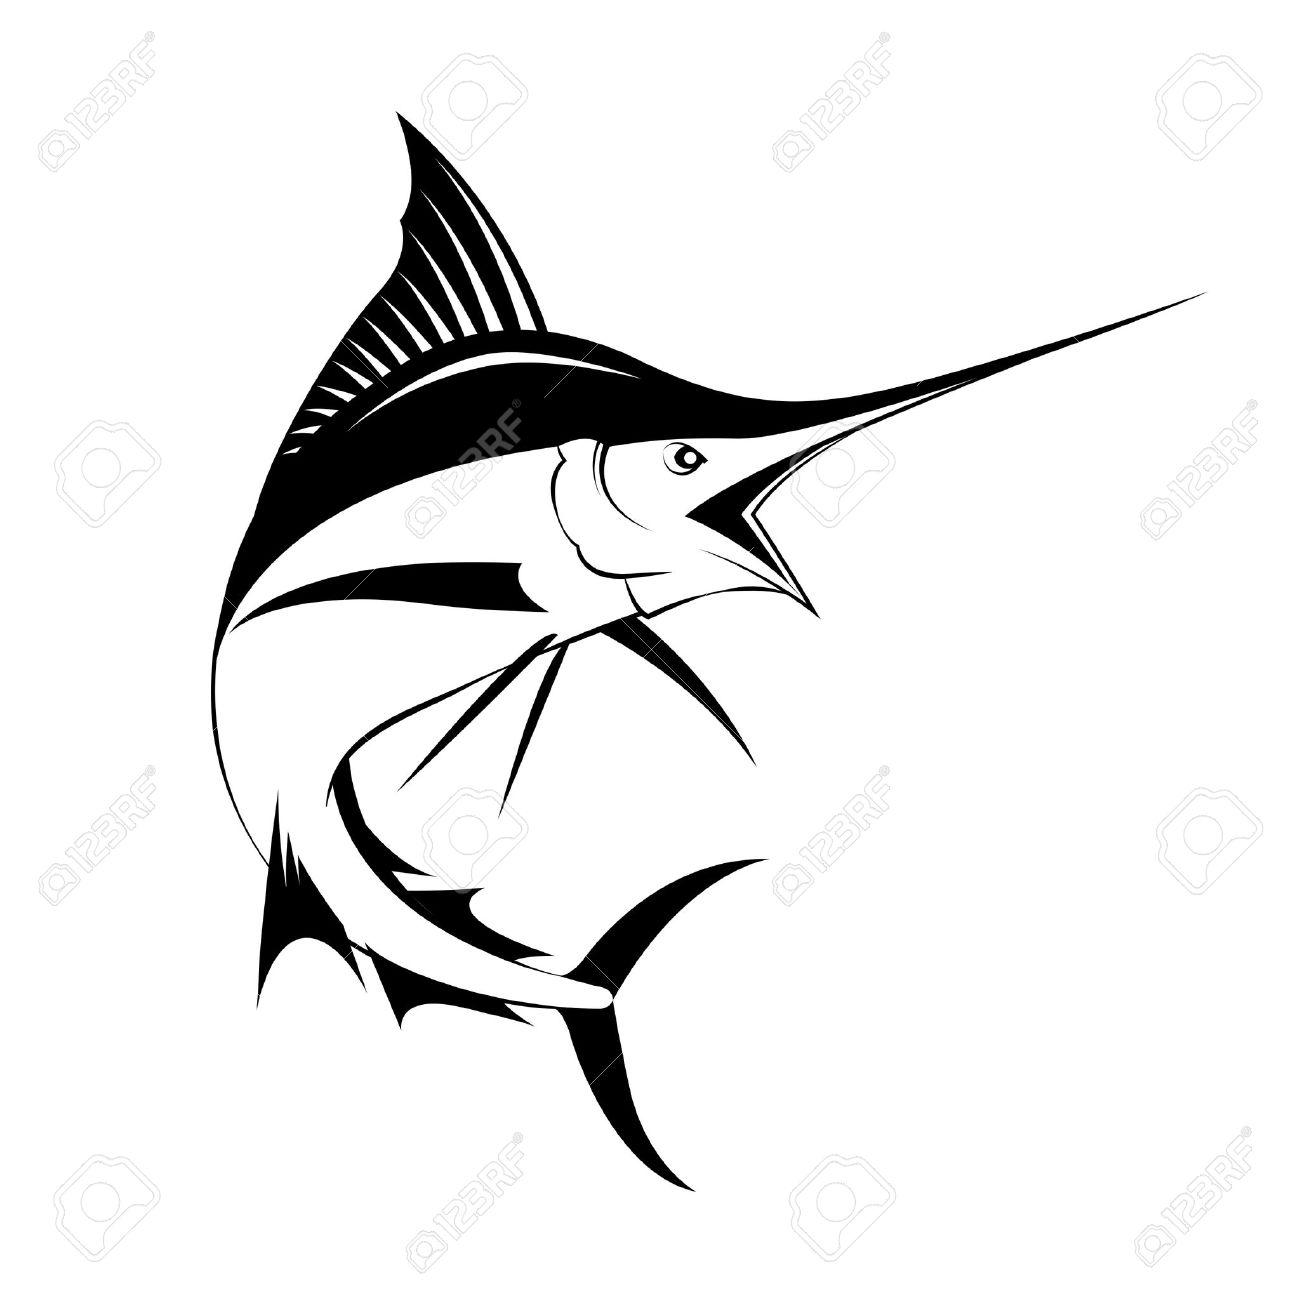 marlin fish vector royalty free cliparts vectors and stock rh 123rf com Fish Skeleton Clip Art Fish Silhouette Clip Art